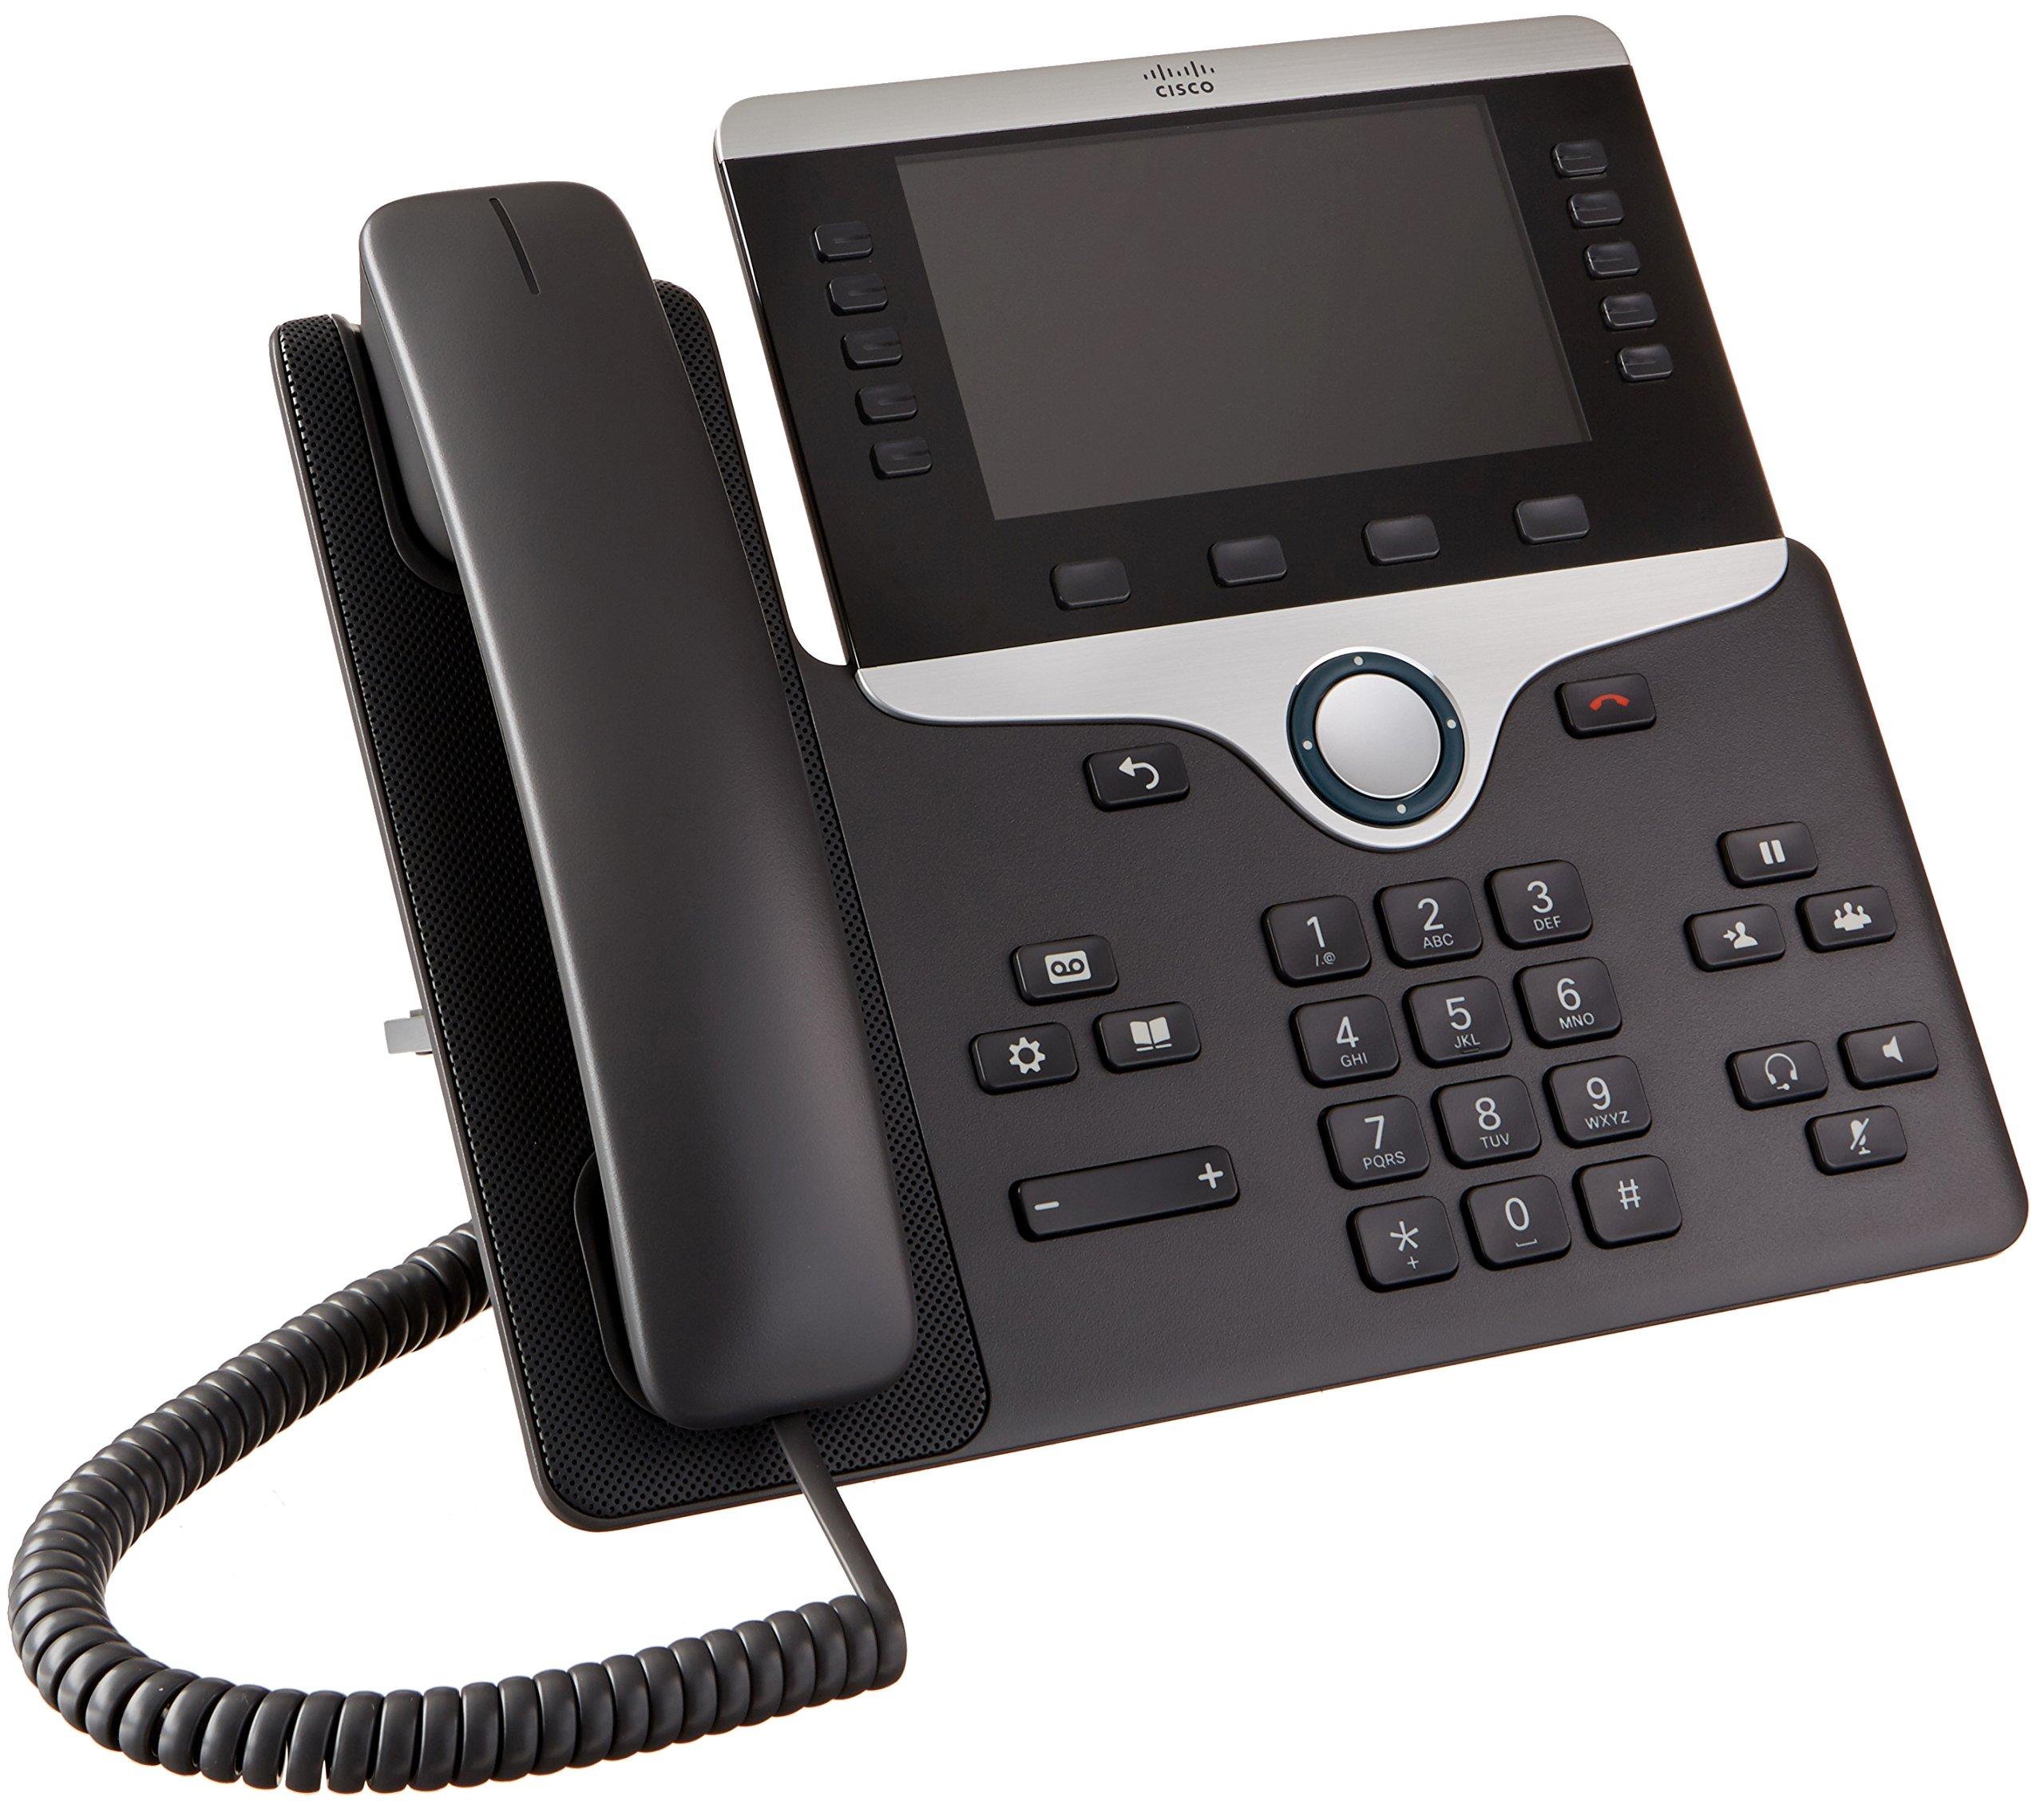 Cisco CP-8851-K9= 8851 IP Phone 5''